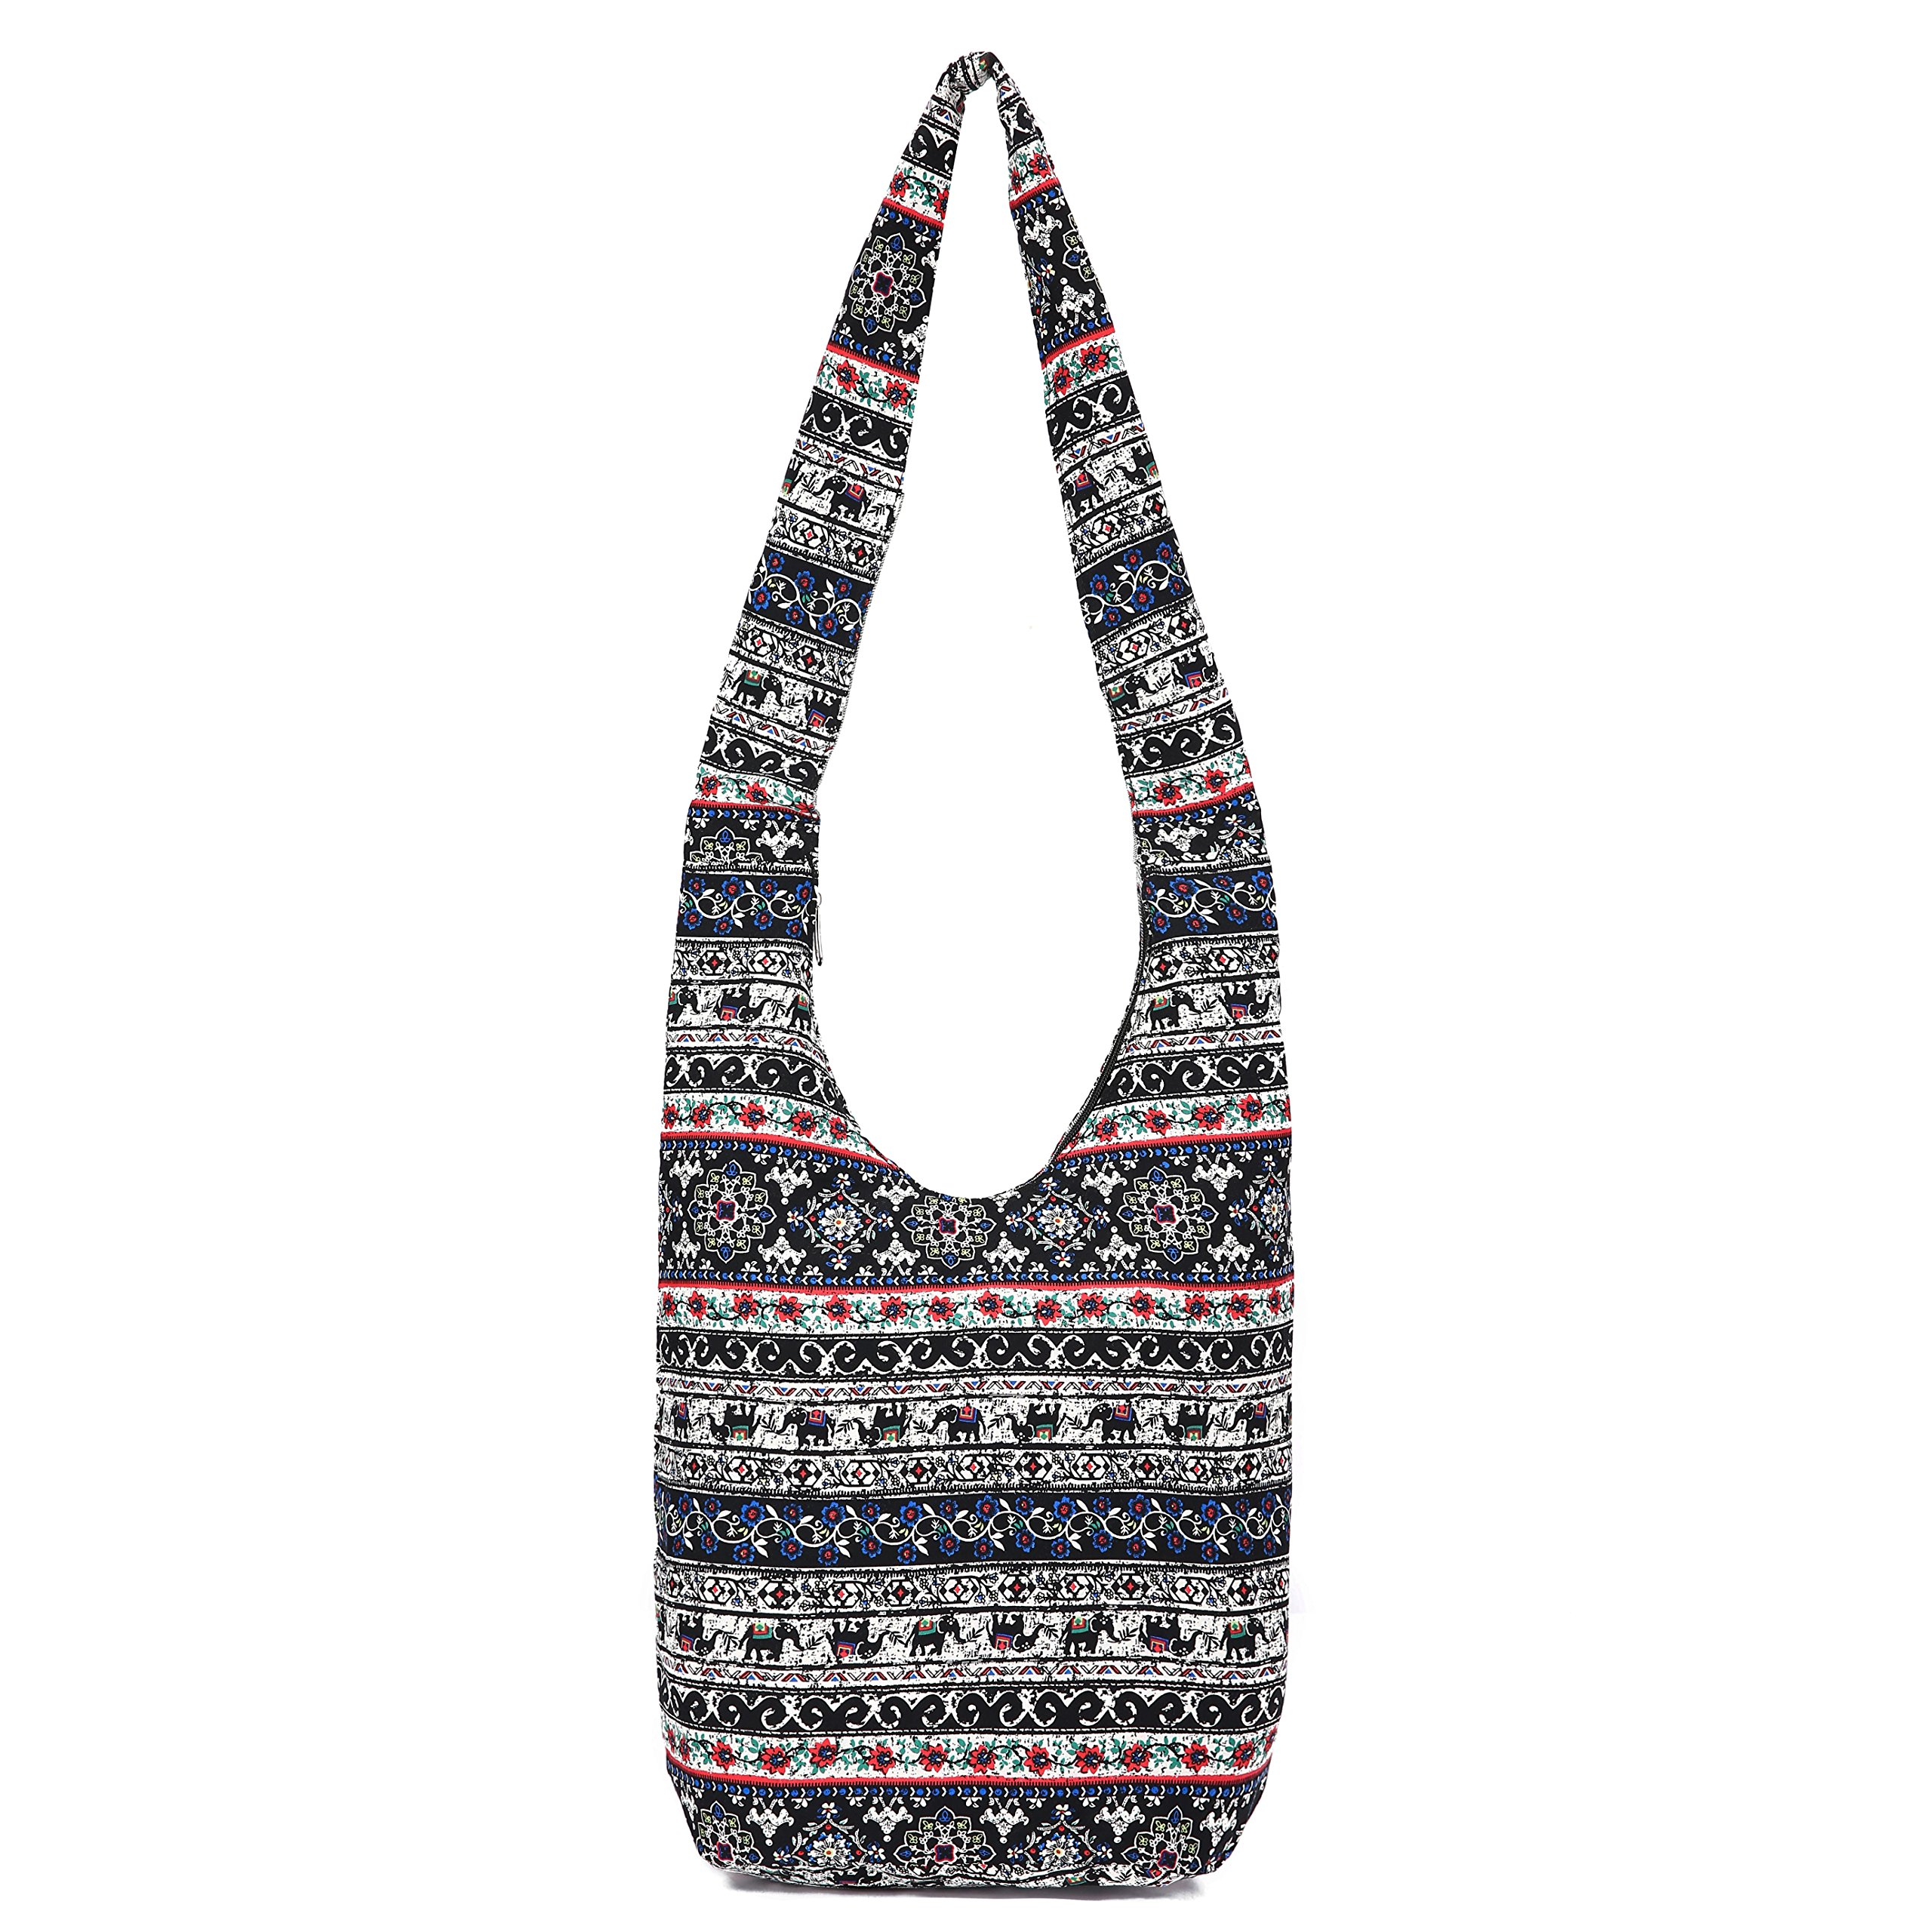 MIANZI Women Hand Fashion canvas Crossbody Bags Cotton Bohemian Animal Prints Hobo Bags (multi)